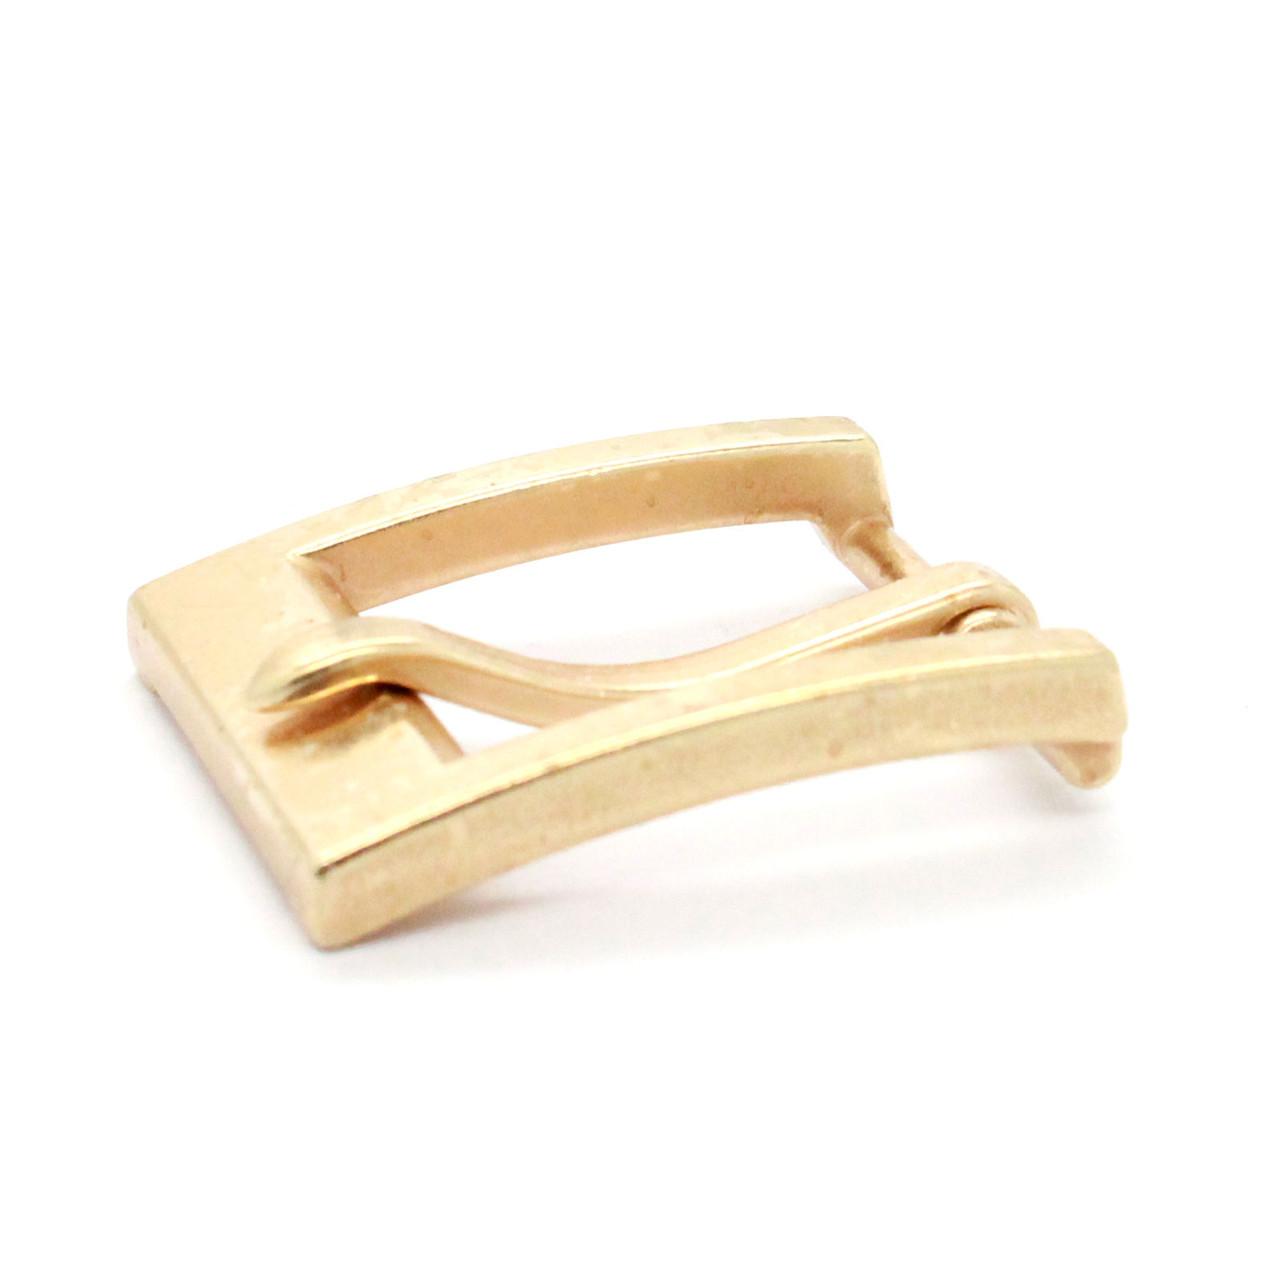 "Heel Bar Belt Buckle Brass Plated 1-1/4"" Side"